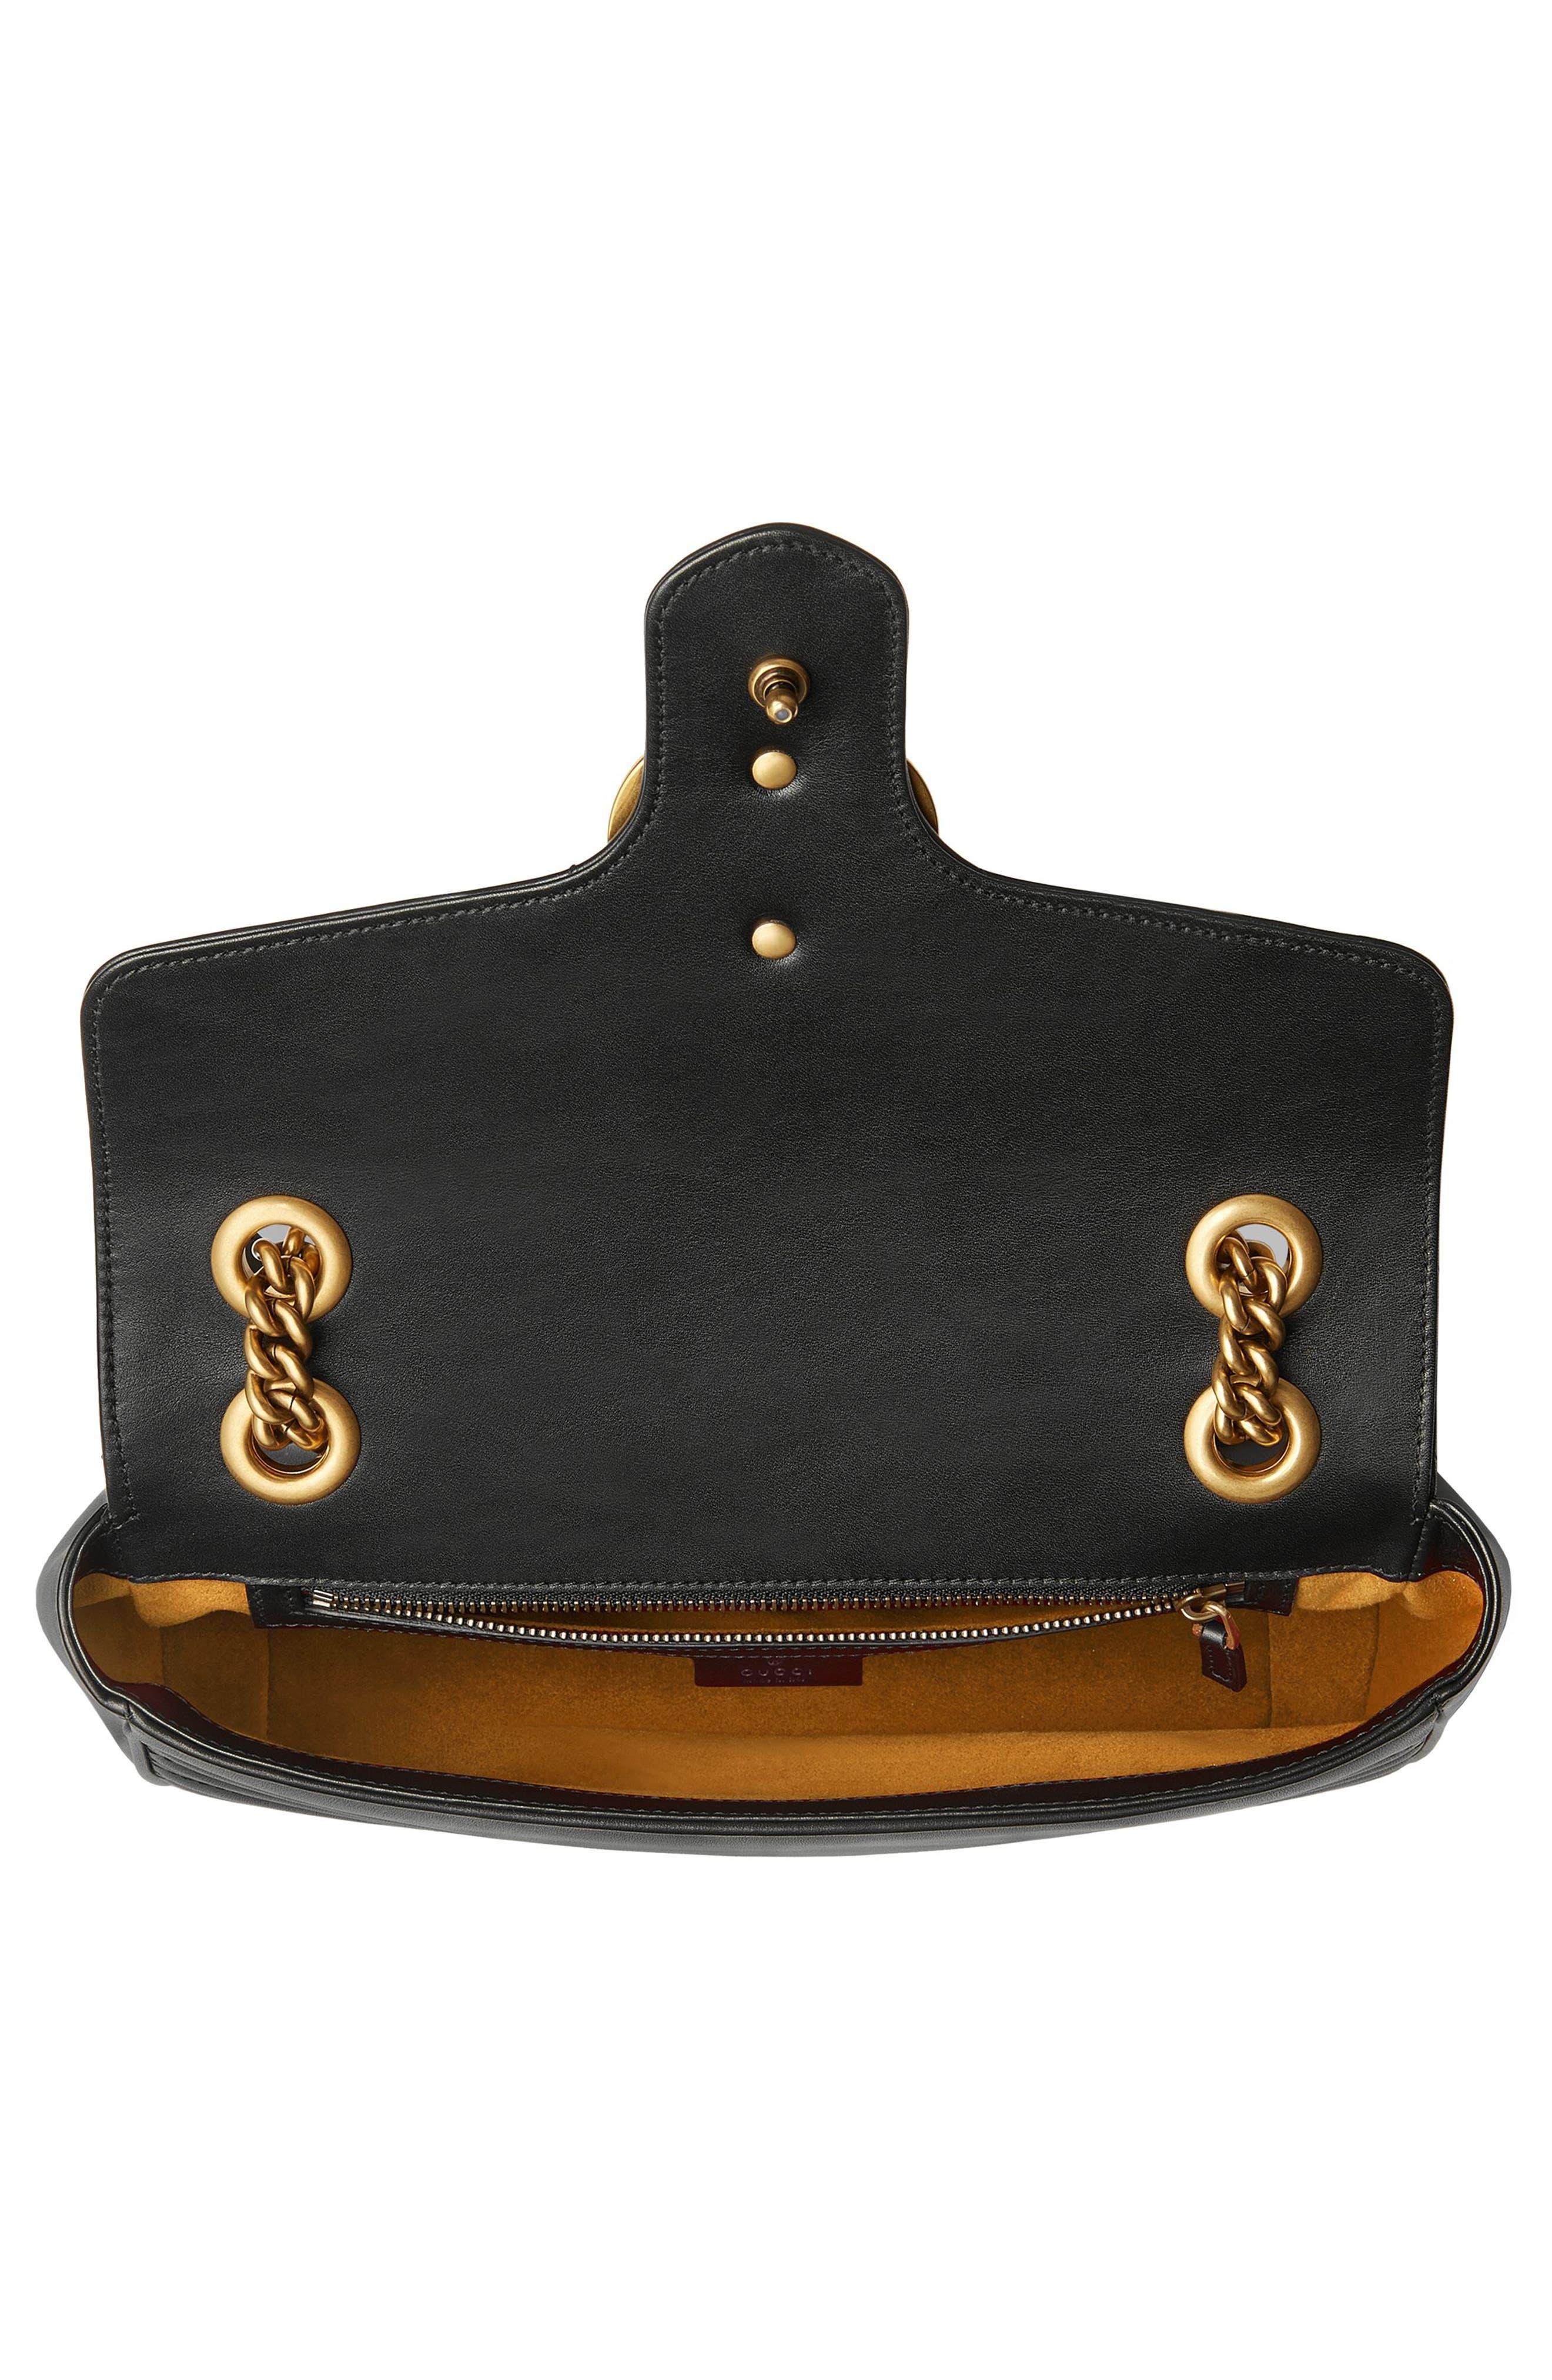 Small GG Marmont 2.0 Matelassé Leather Shoulder Bag,                             Alternate thumbnail 3, color,                             NERO/ NERO